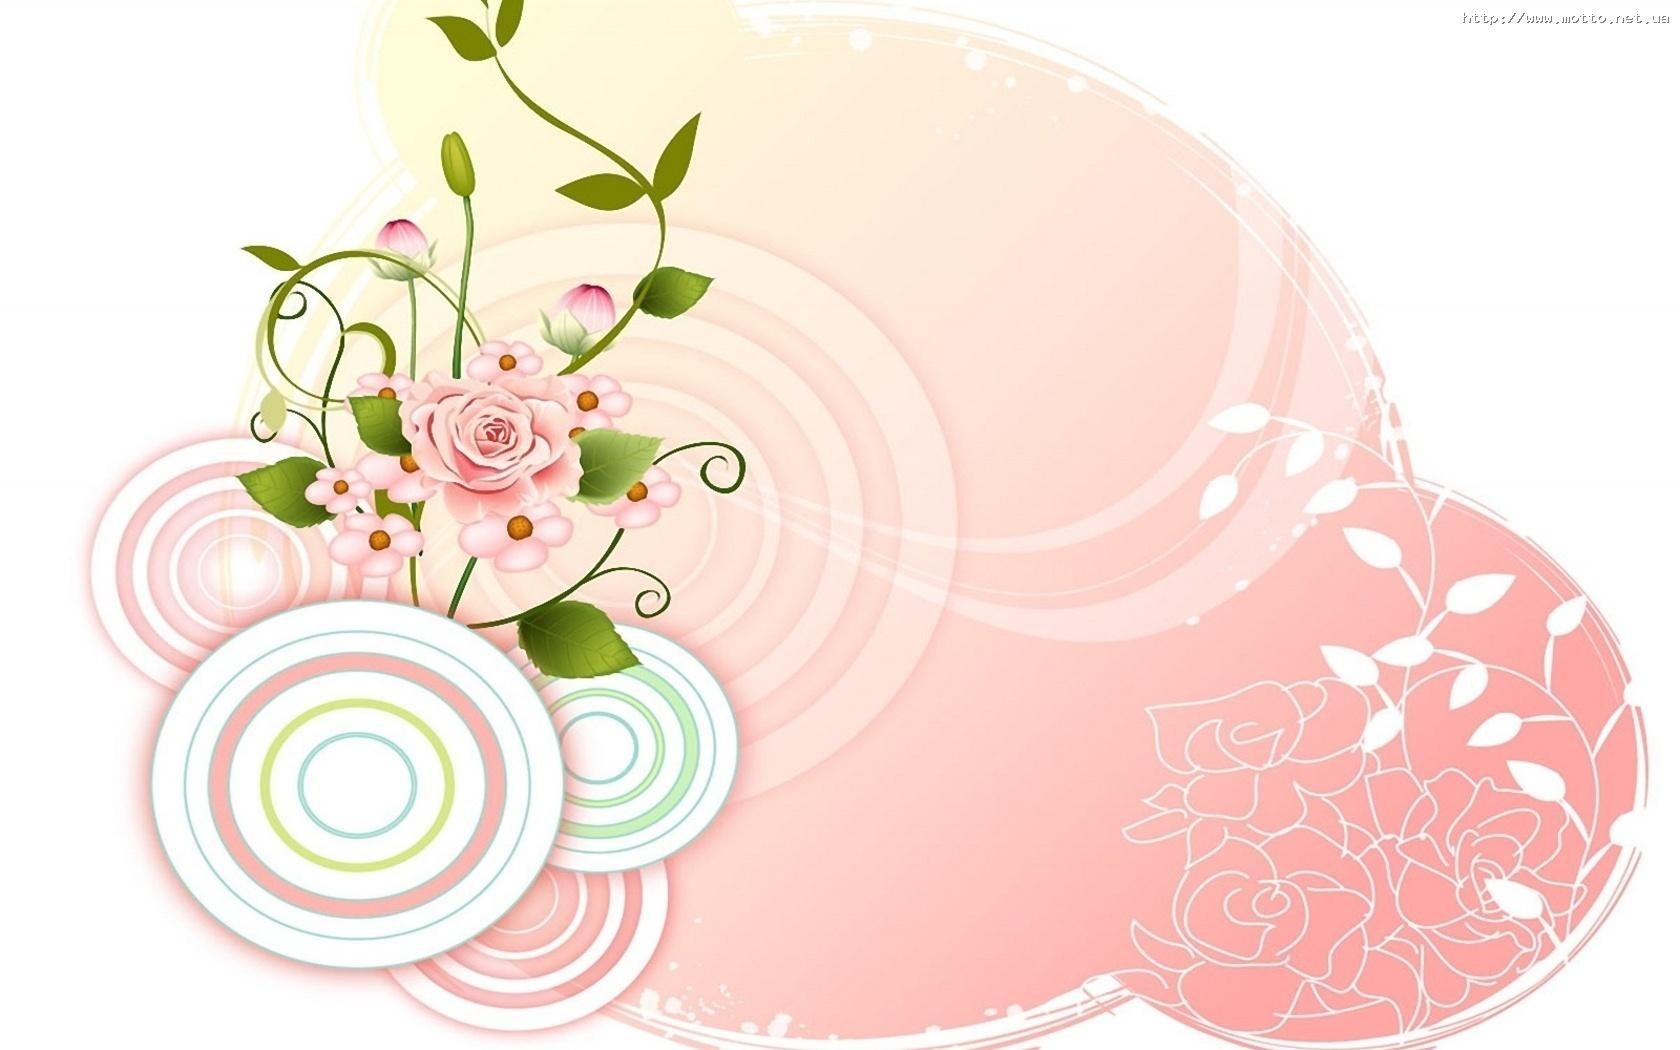 9911 descargar fondo de pantalla Plantas, Flores, Imágenes: protectores de pantalla e imágenes gratis